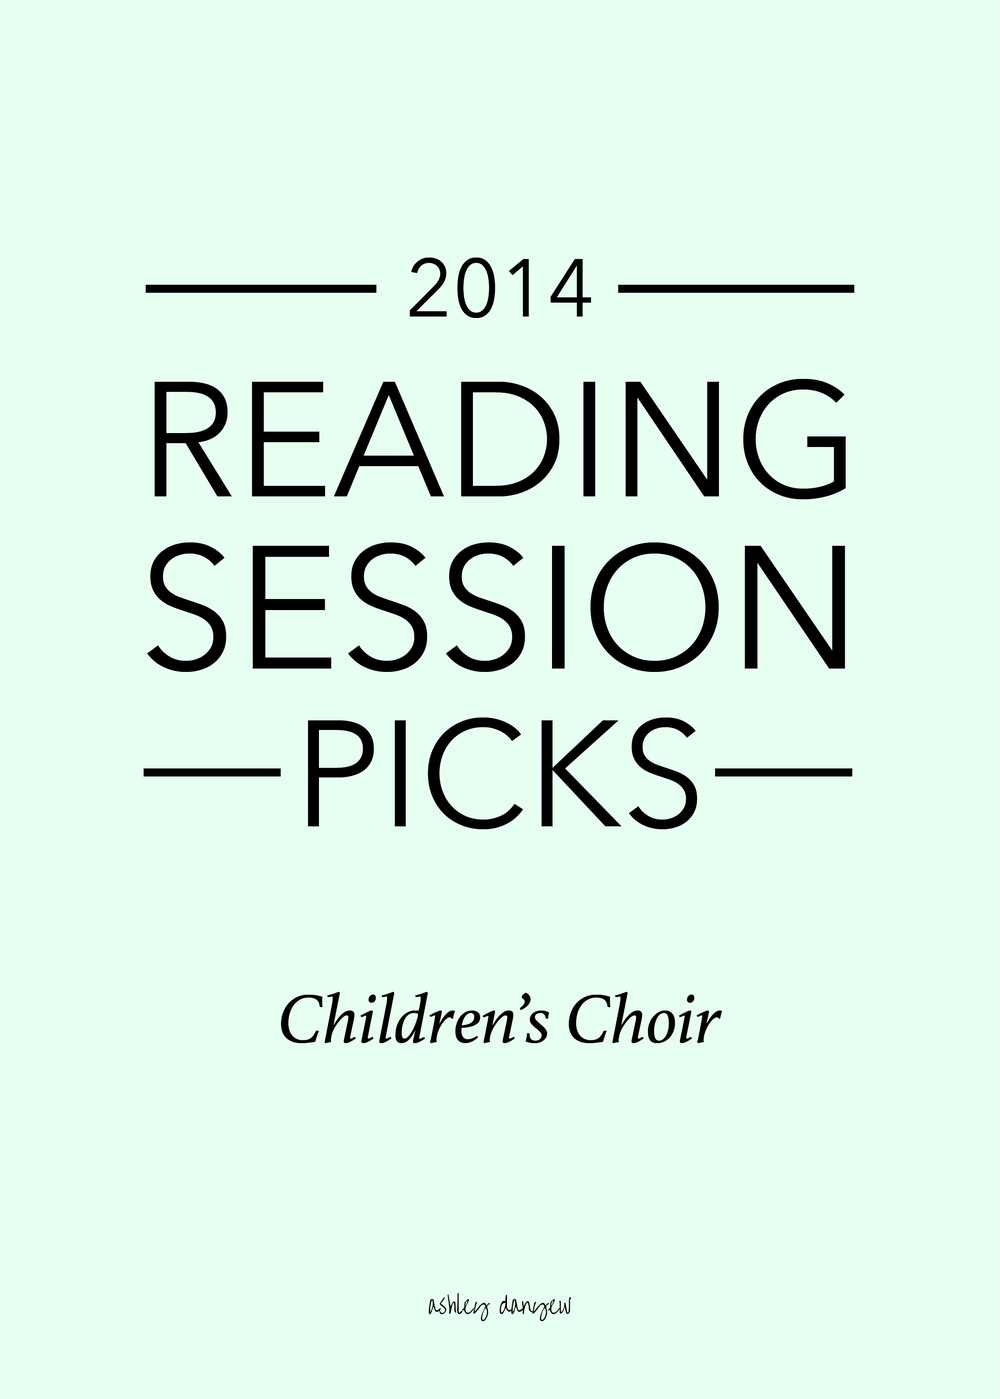 2014 Reading Session Picks.png